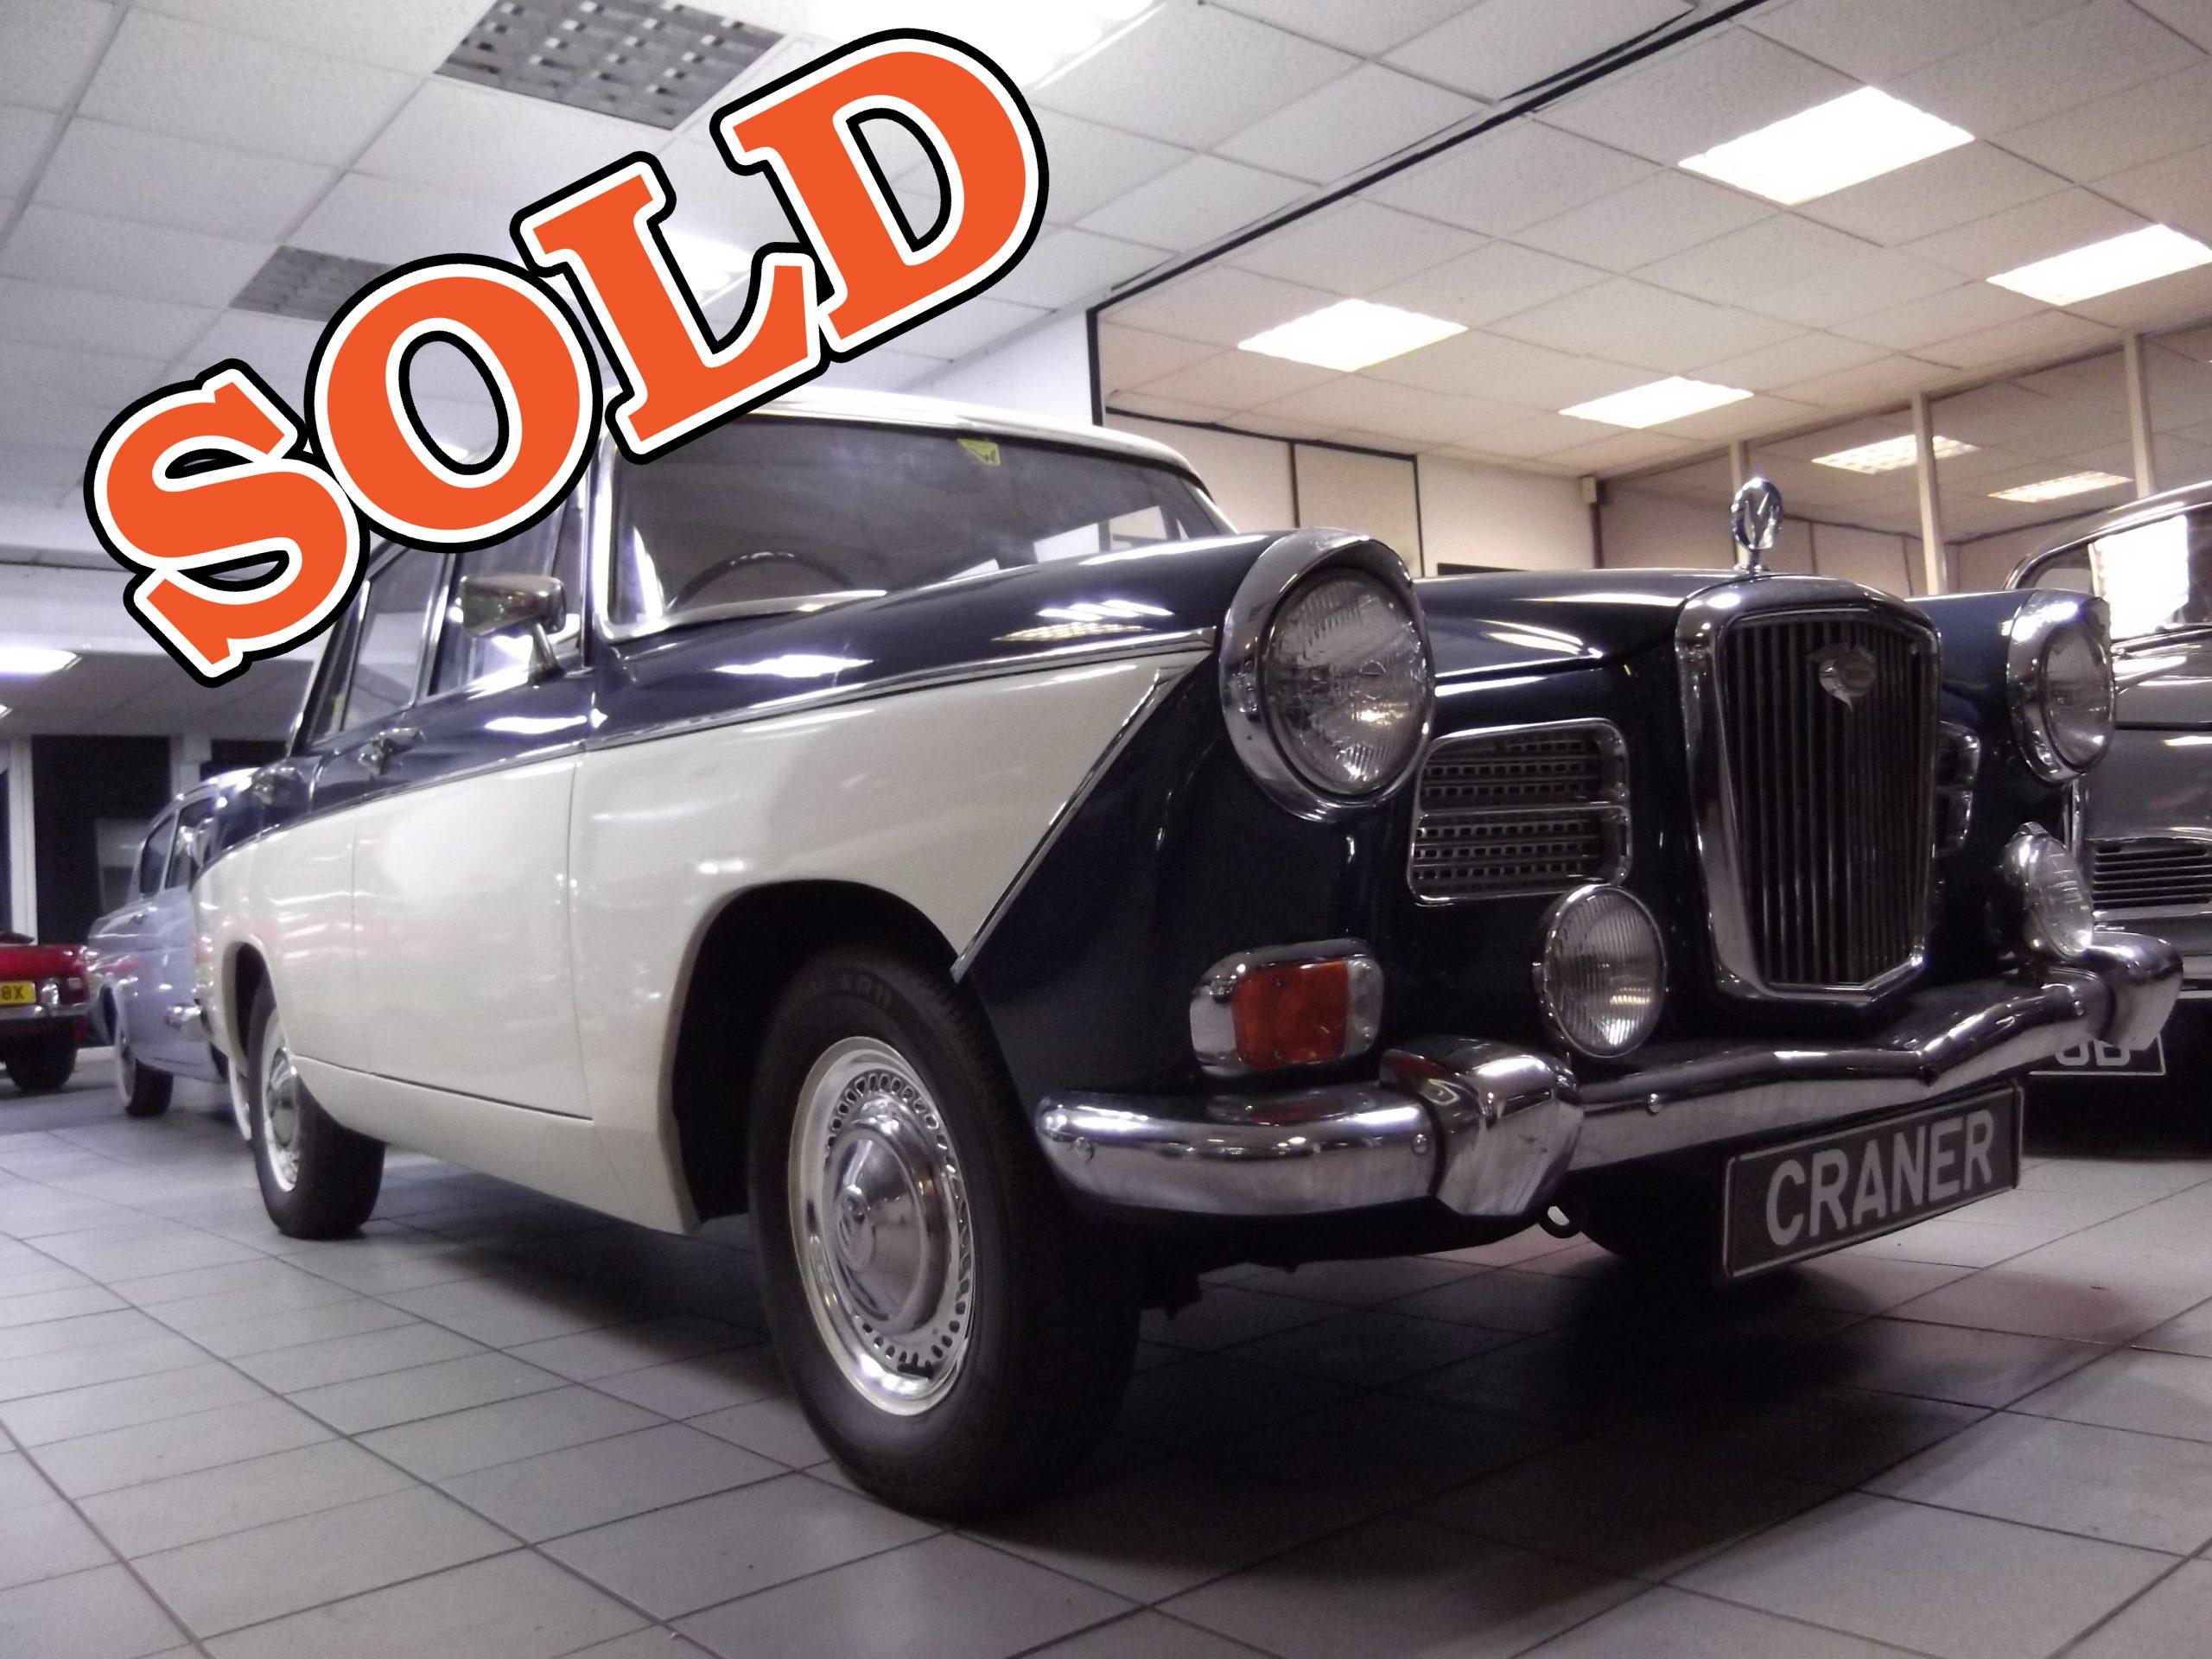 1961-wolseley-1660-craner-classic-cars-sold